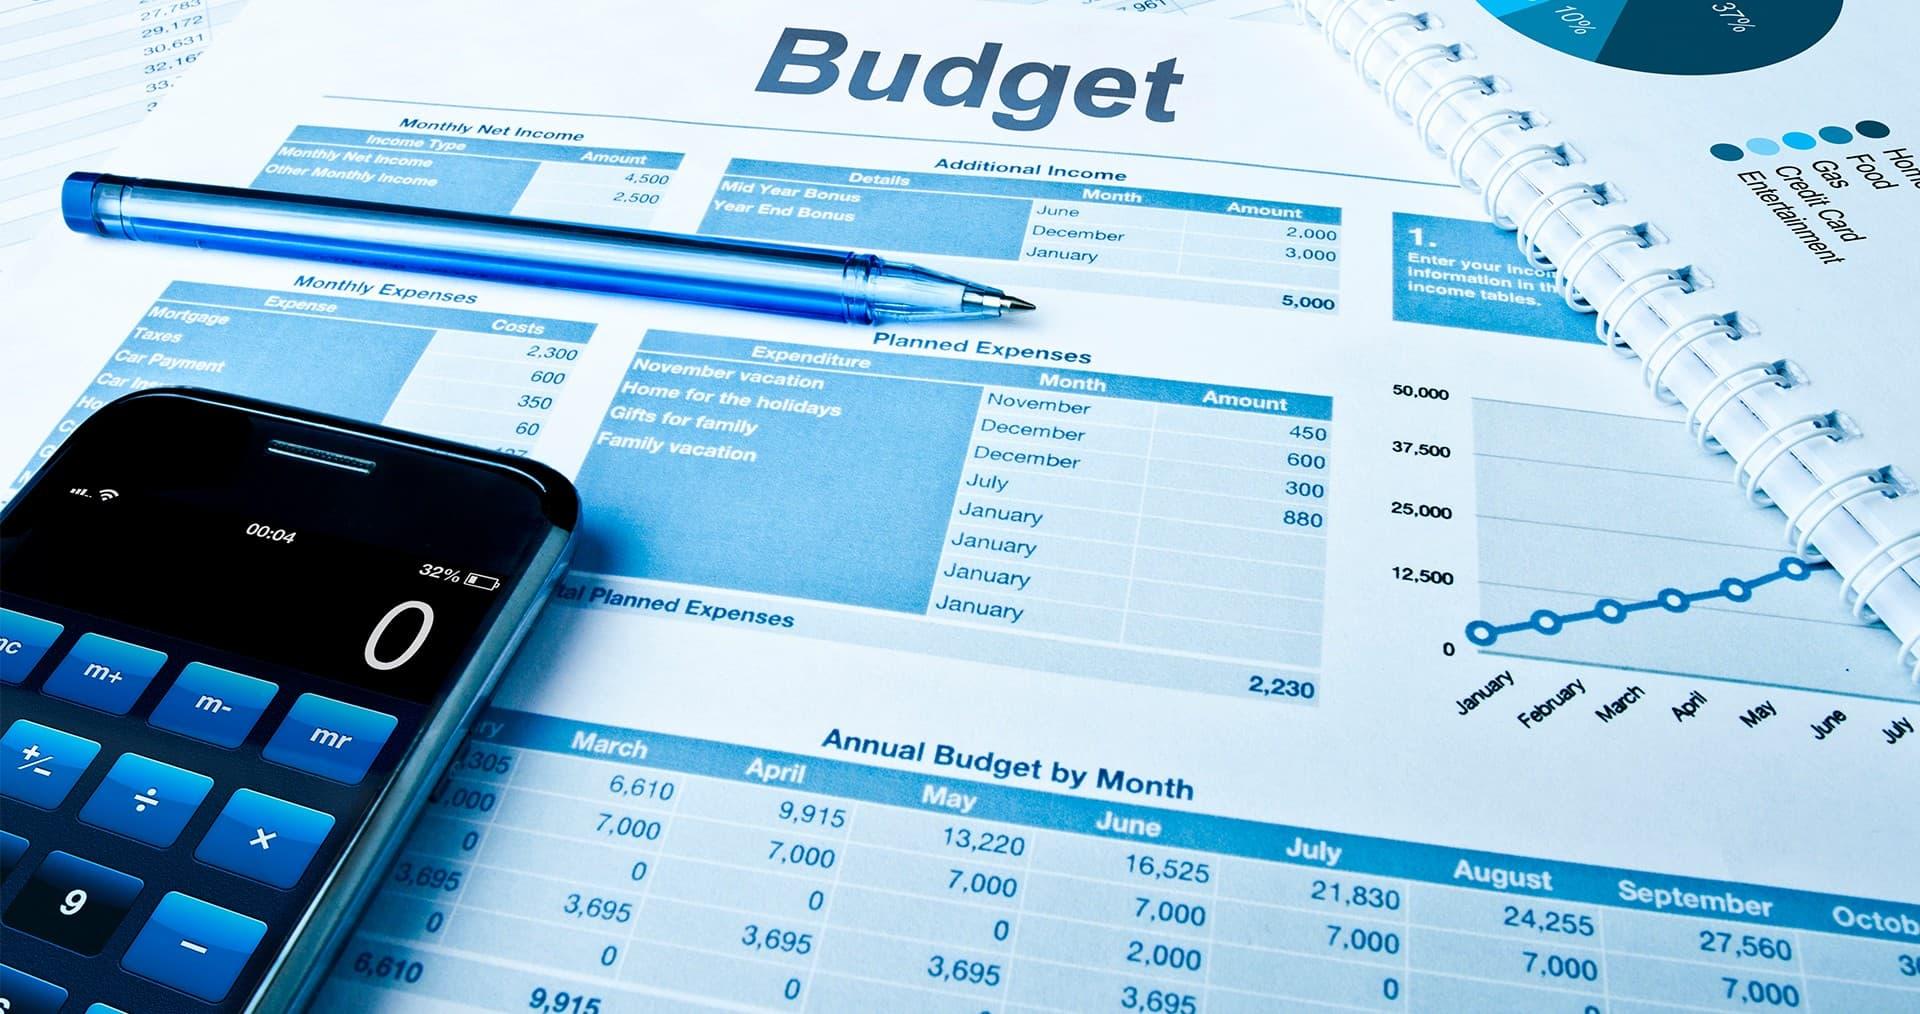 Как экономить бюджет без фанатизма